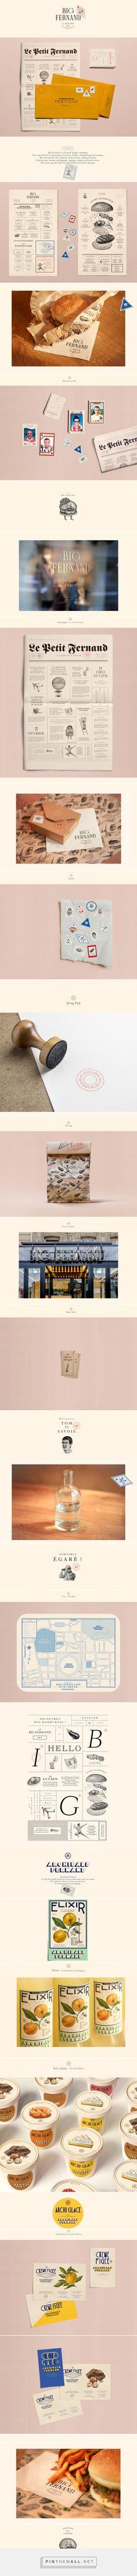 Big Fernand French Burger Restaurant Branding and Menu Design by Violaine & Jeremy